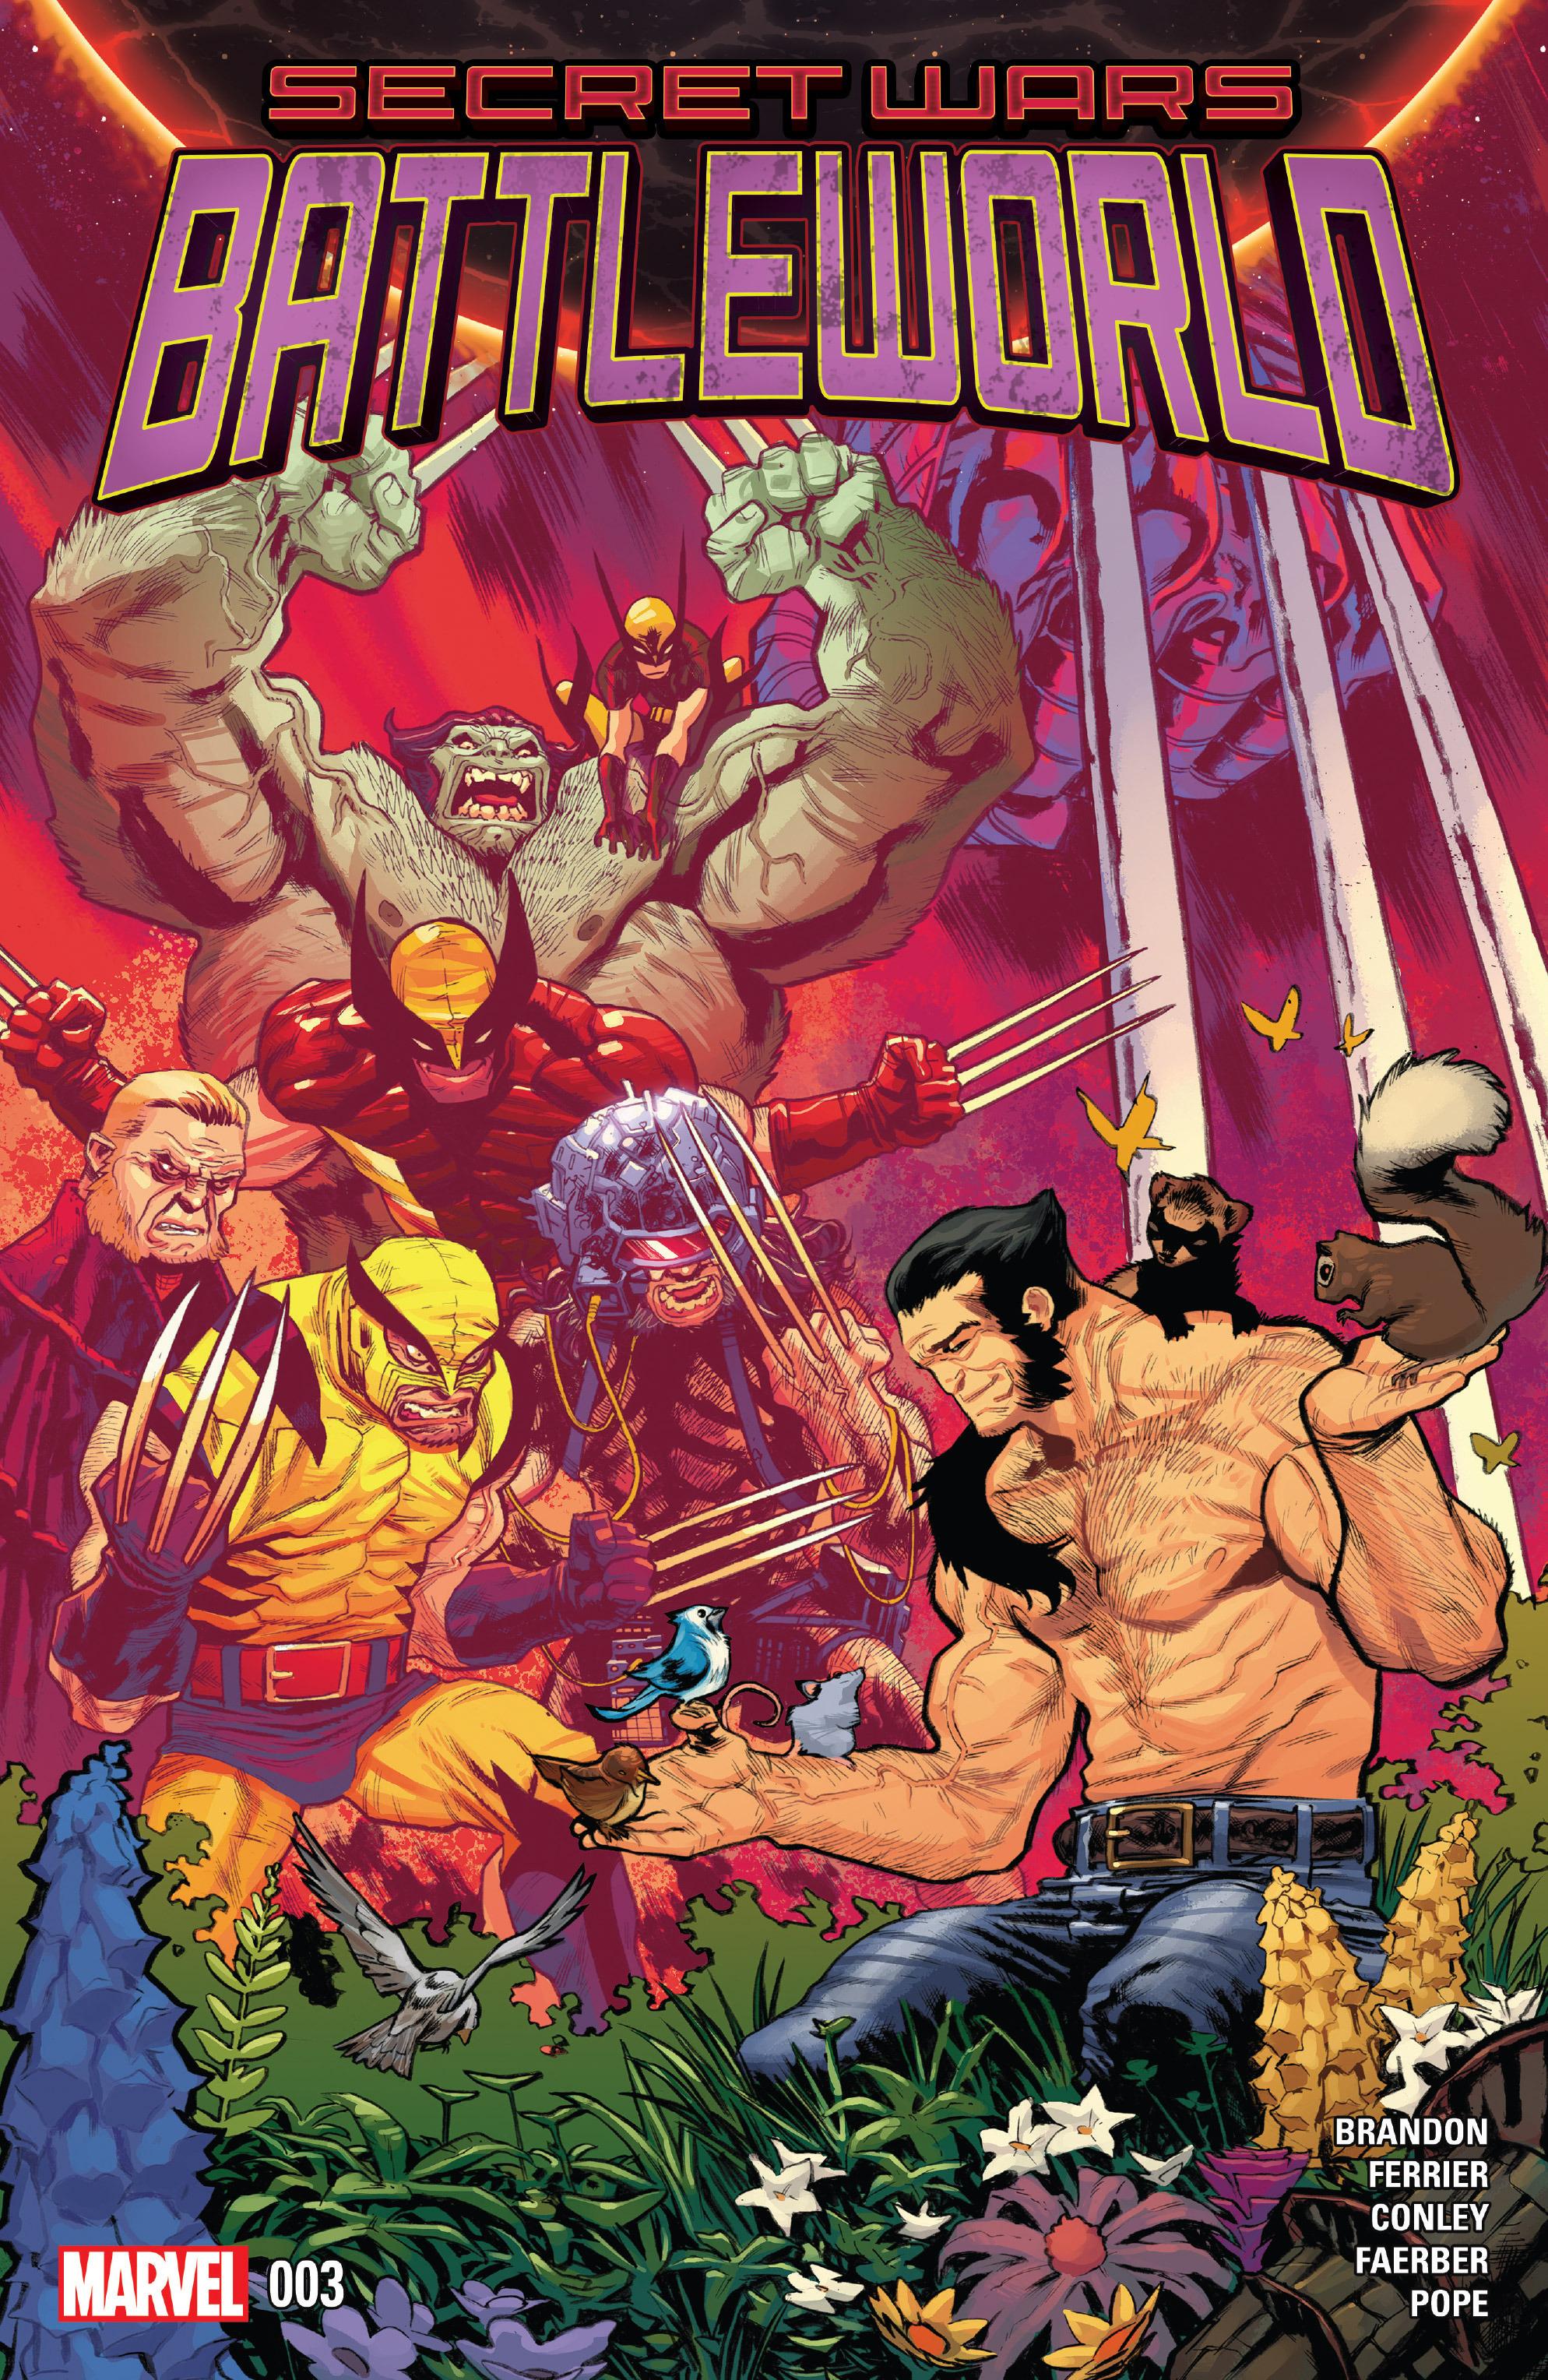 Read online Secret Wars Journal/Battleworld comic -  Issue # TPB - 166